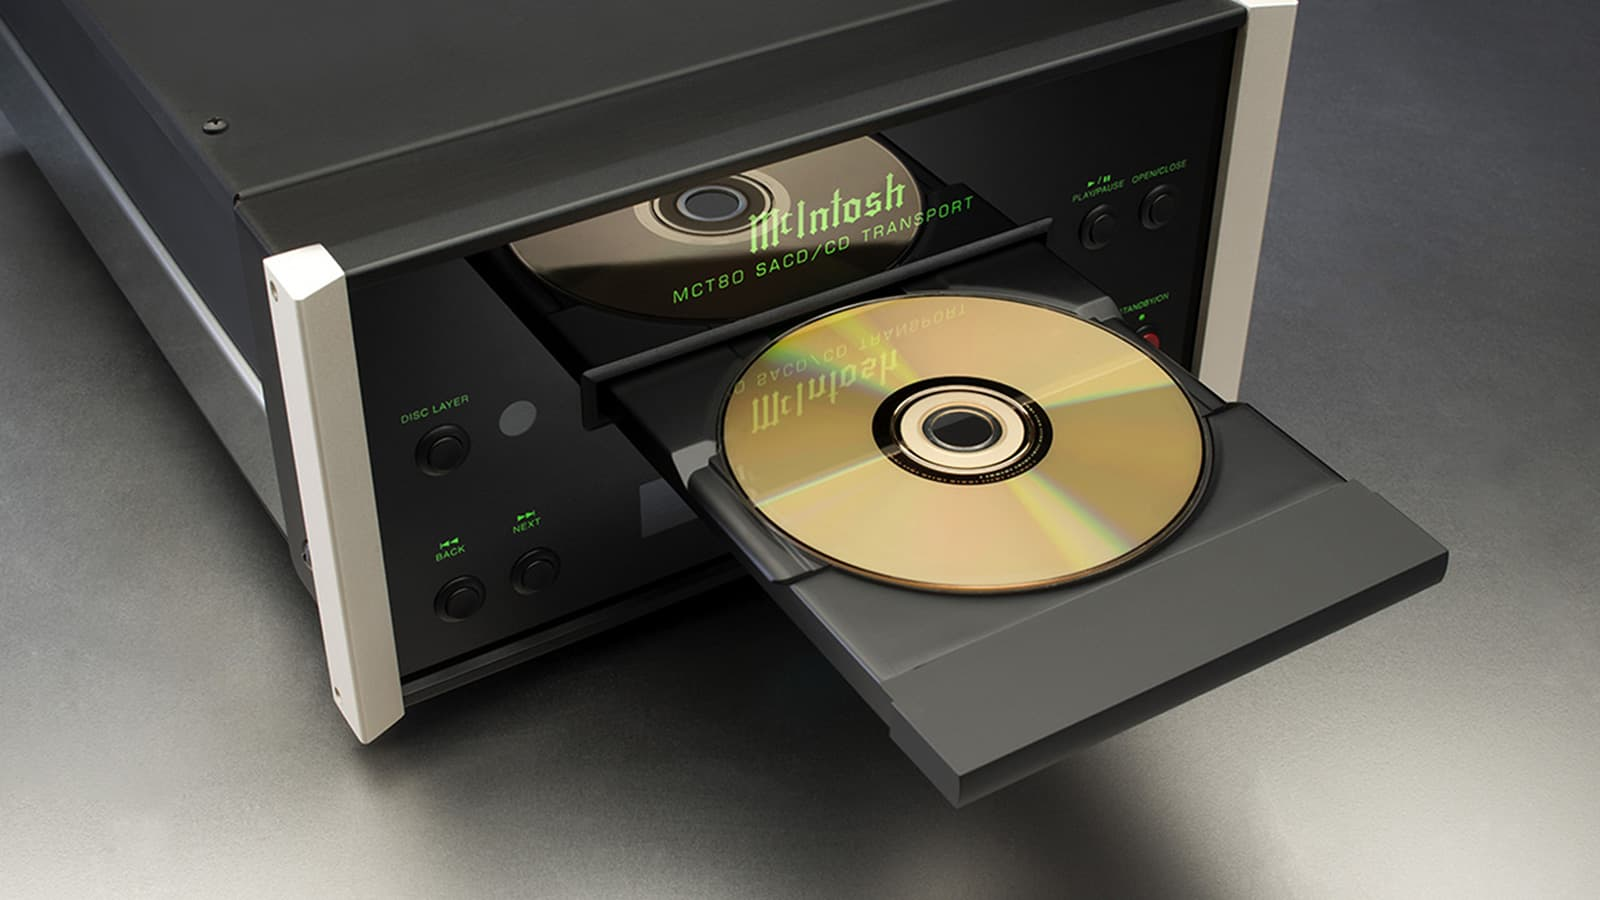 mcintosh-mct80-stereo-sacd-cd-transport